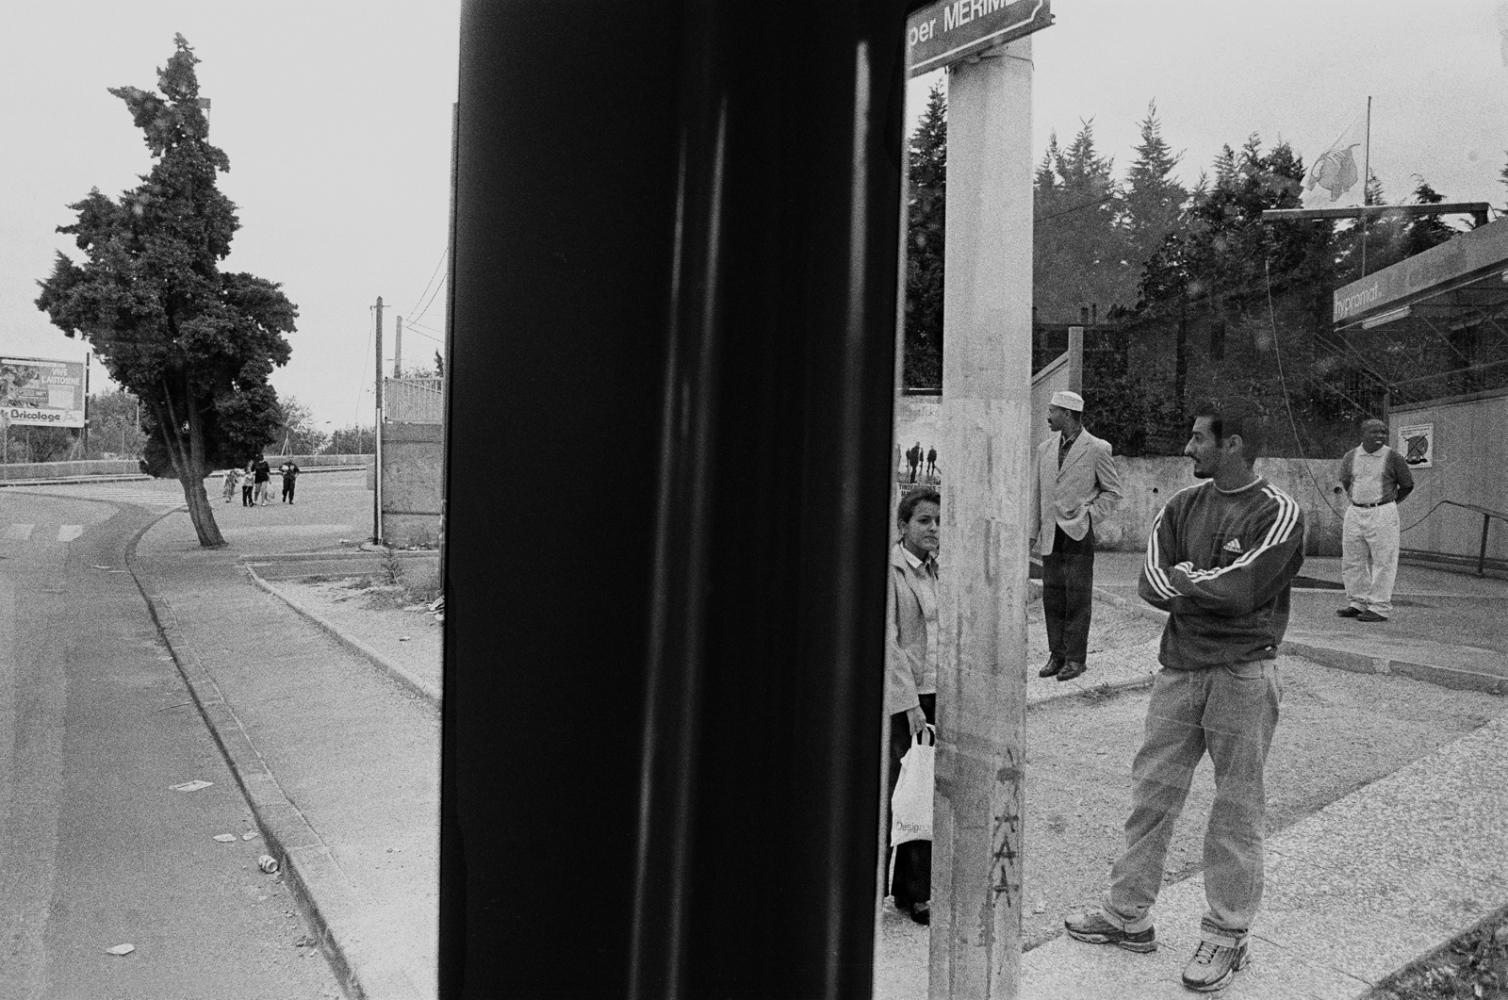 Art and Documentary Photography - Loading 024_a_Marseille___Fabio_Sgroi.jpg